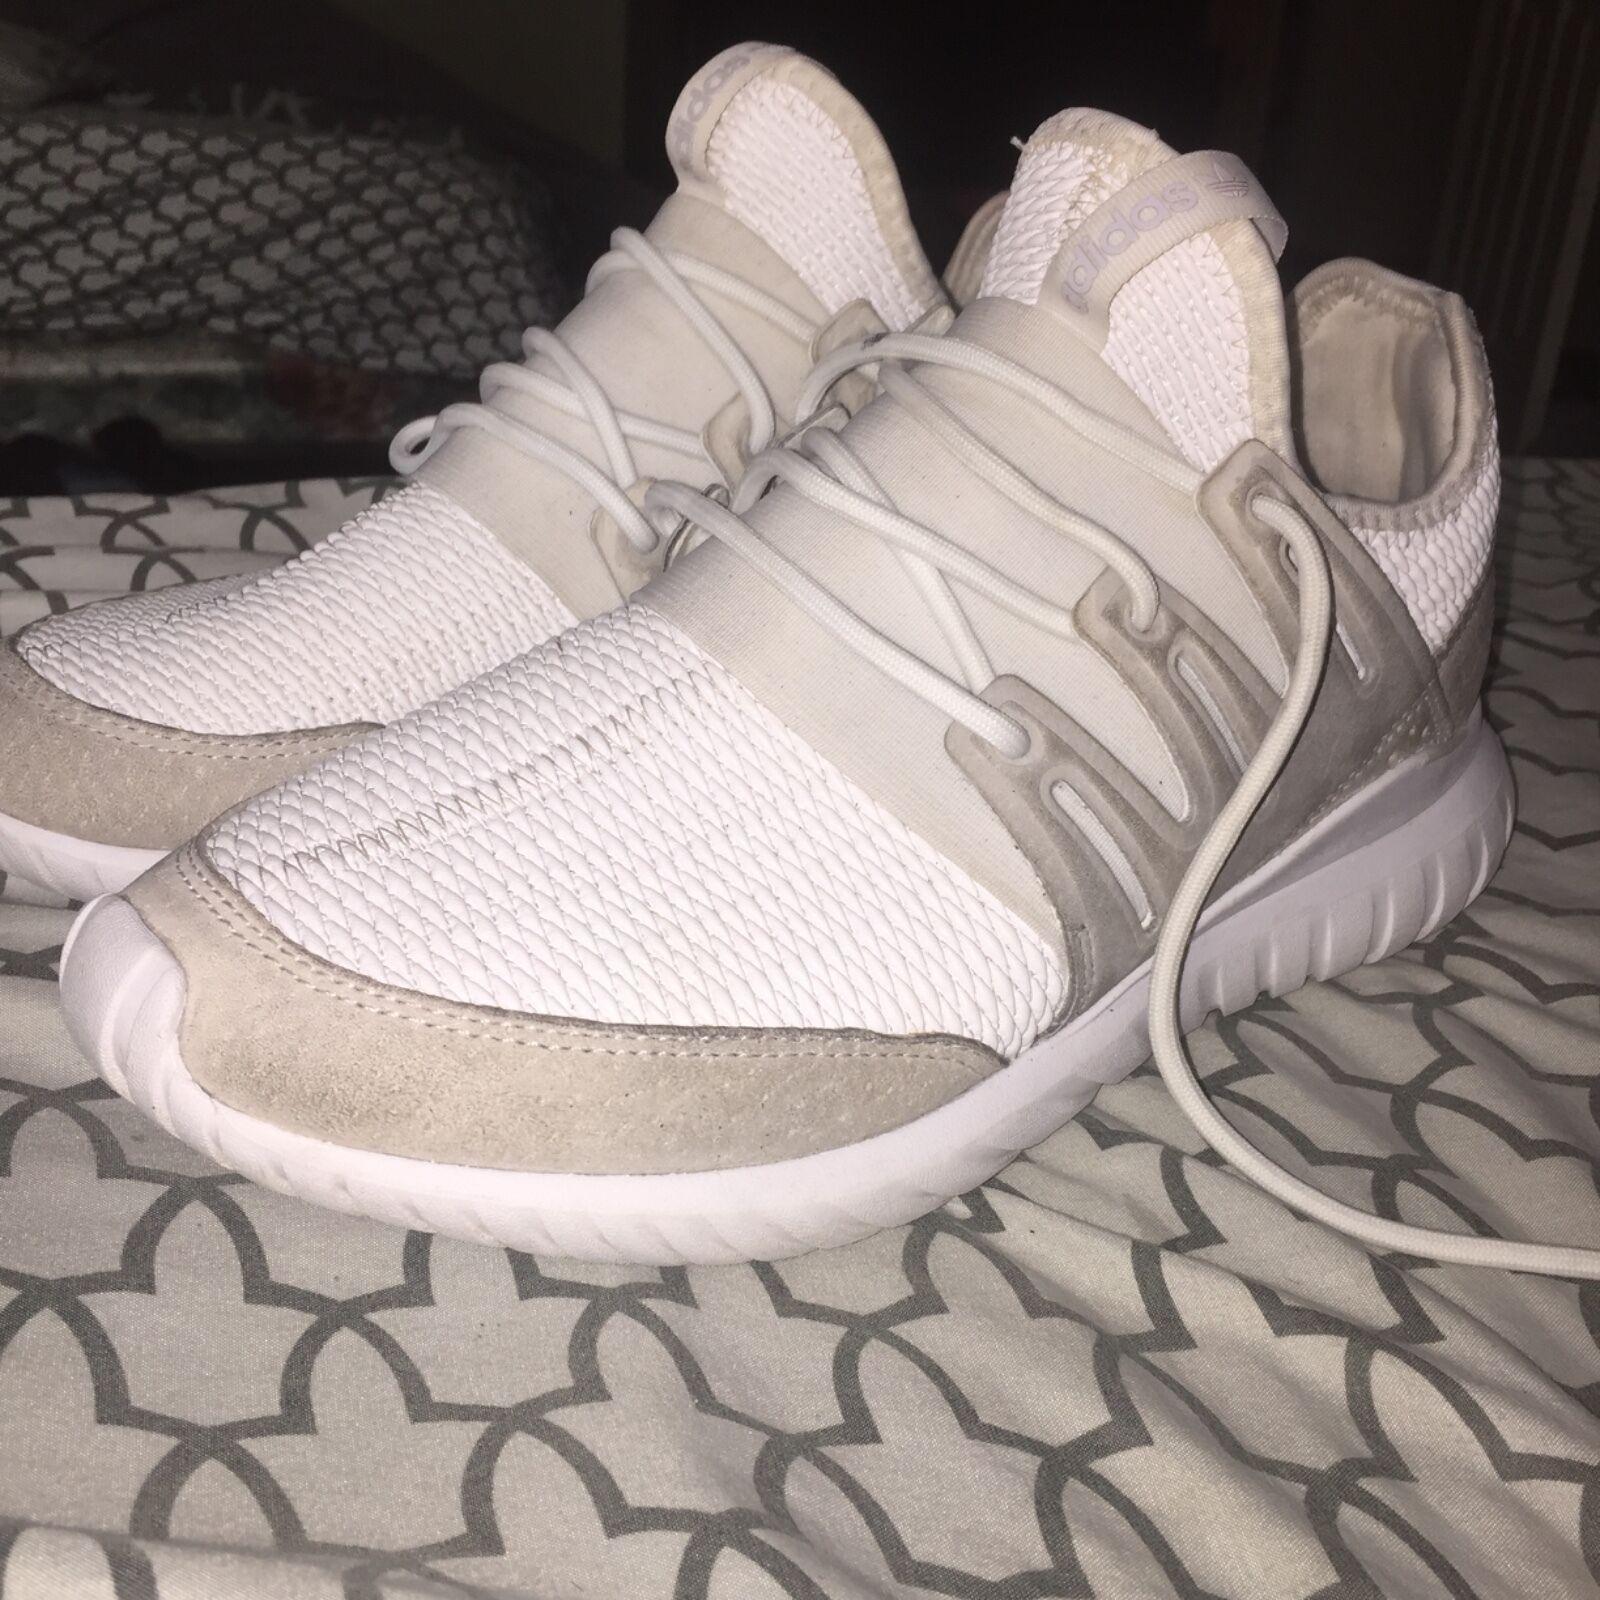 Adidas uomini tubulare radiale bianco noi uomini Adidas '8 1 / 2 indossato 5 volte, in buone condizioni cfdb47